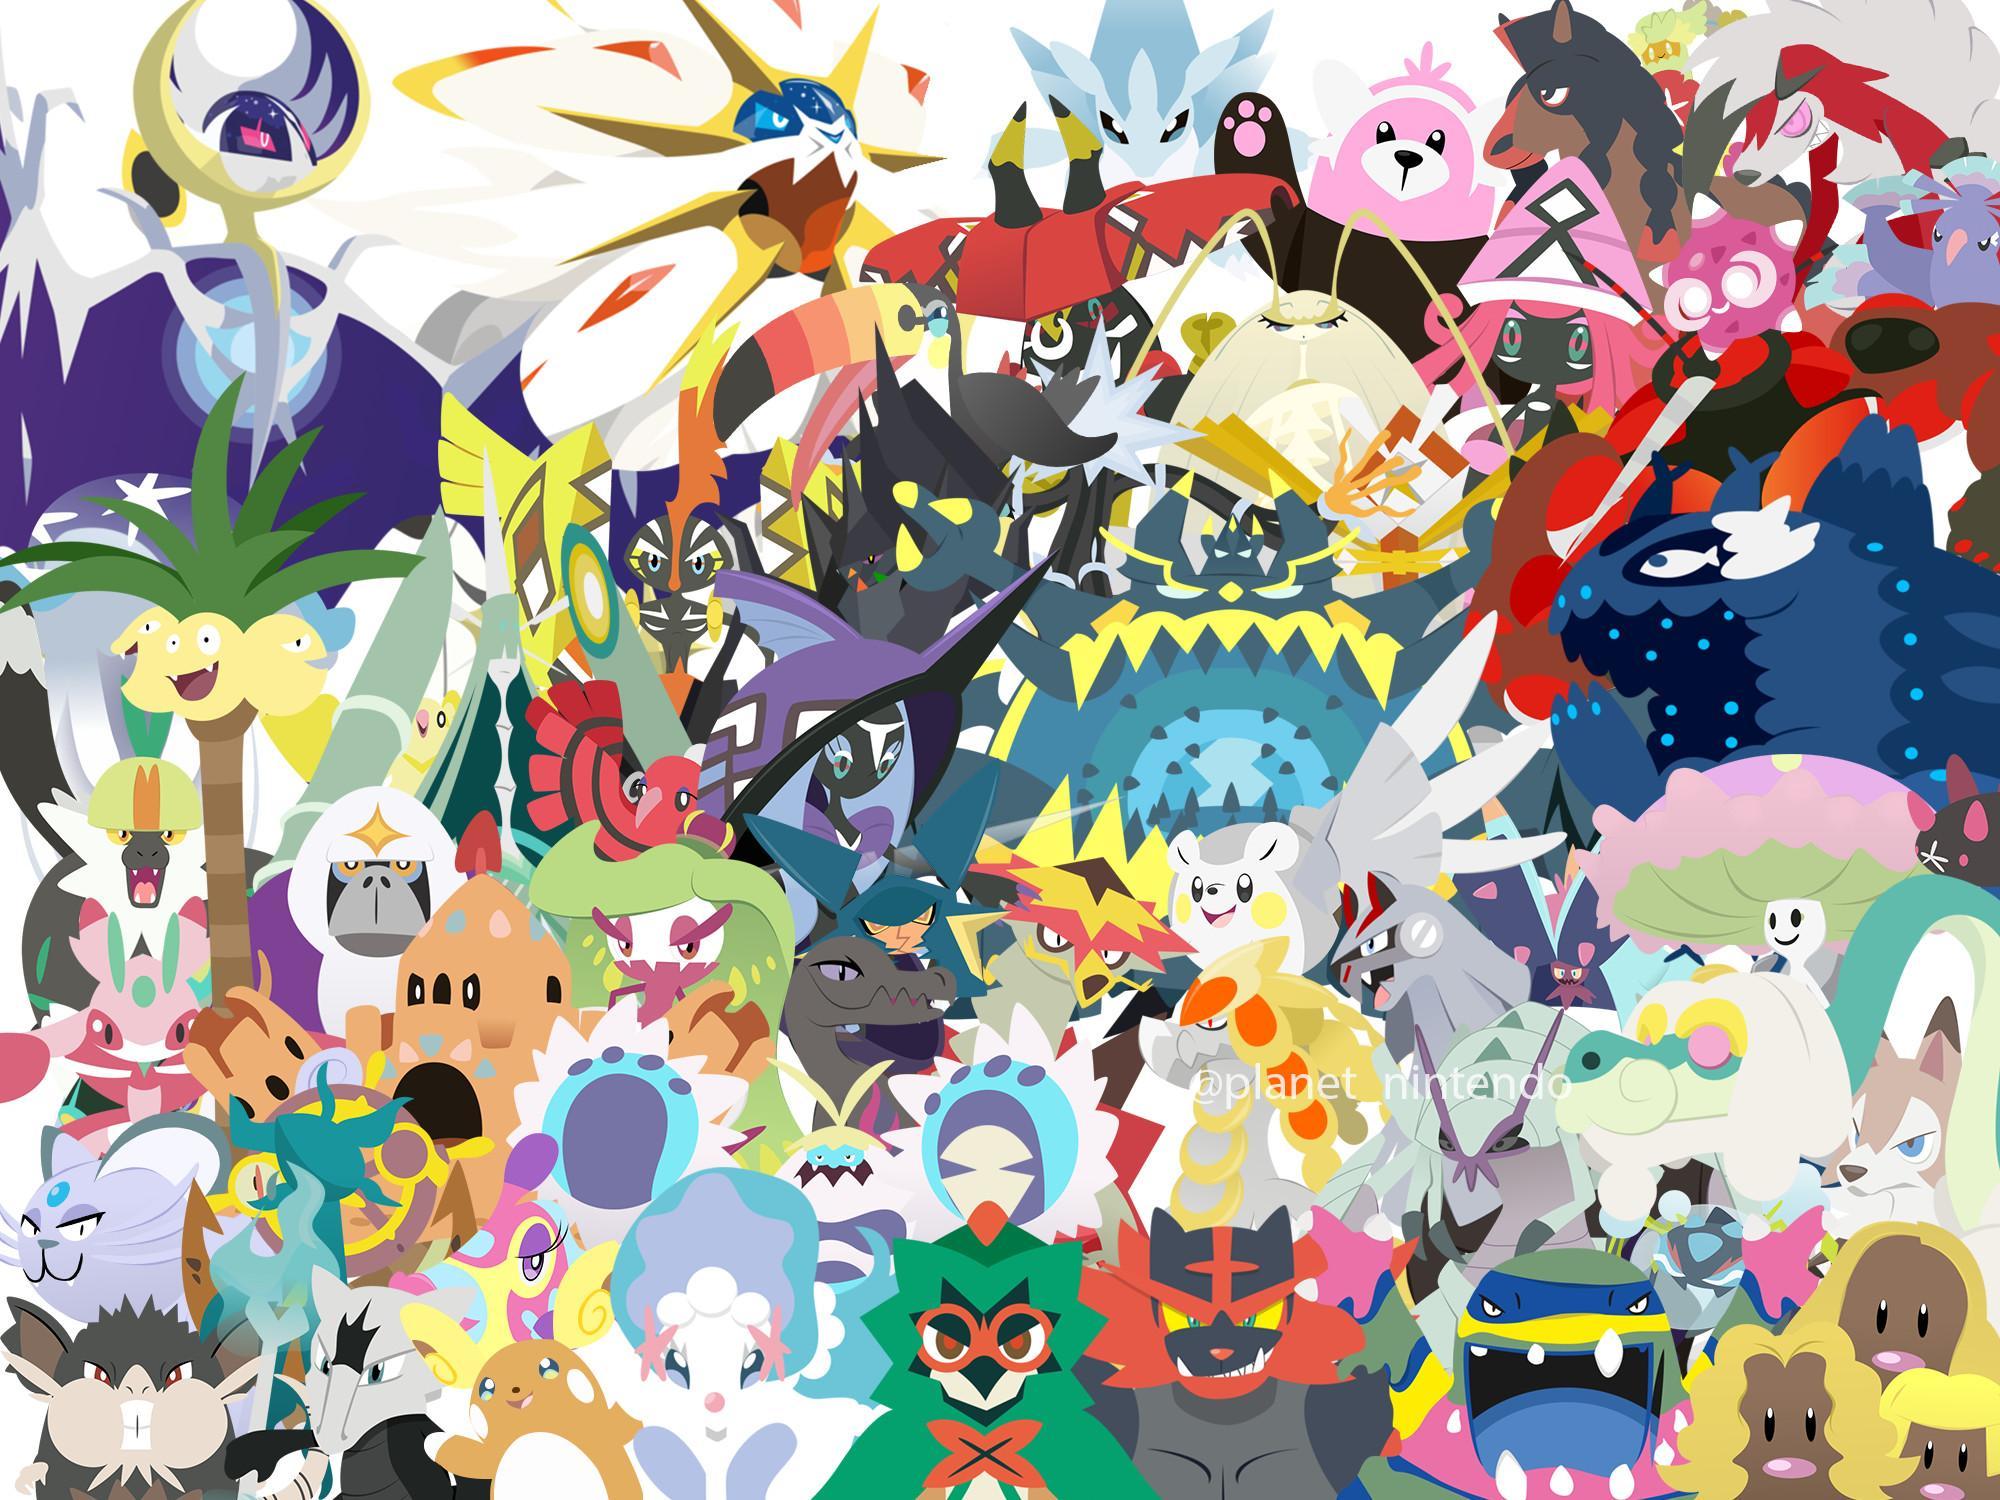 Pokémon Generation 8 Wallpapers Wallpaper Cave